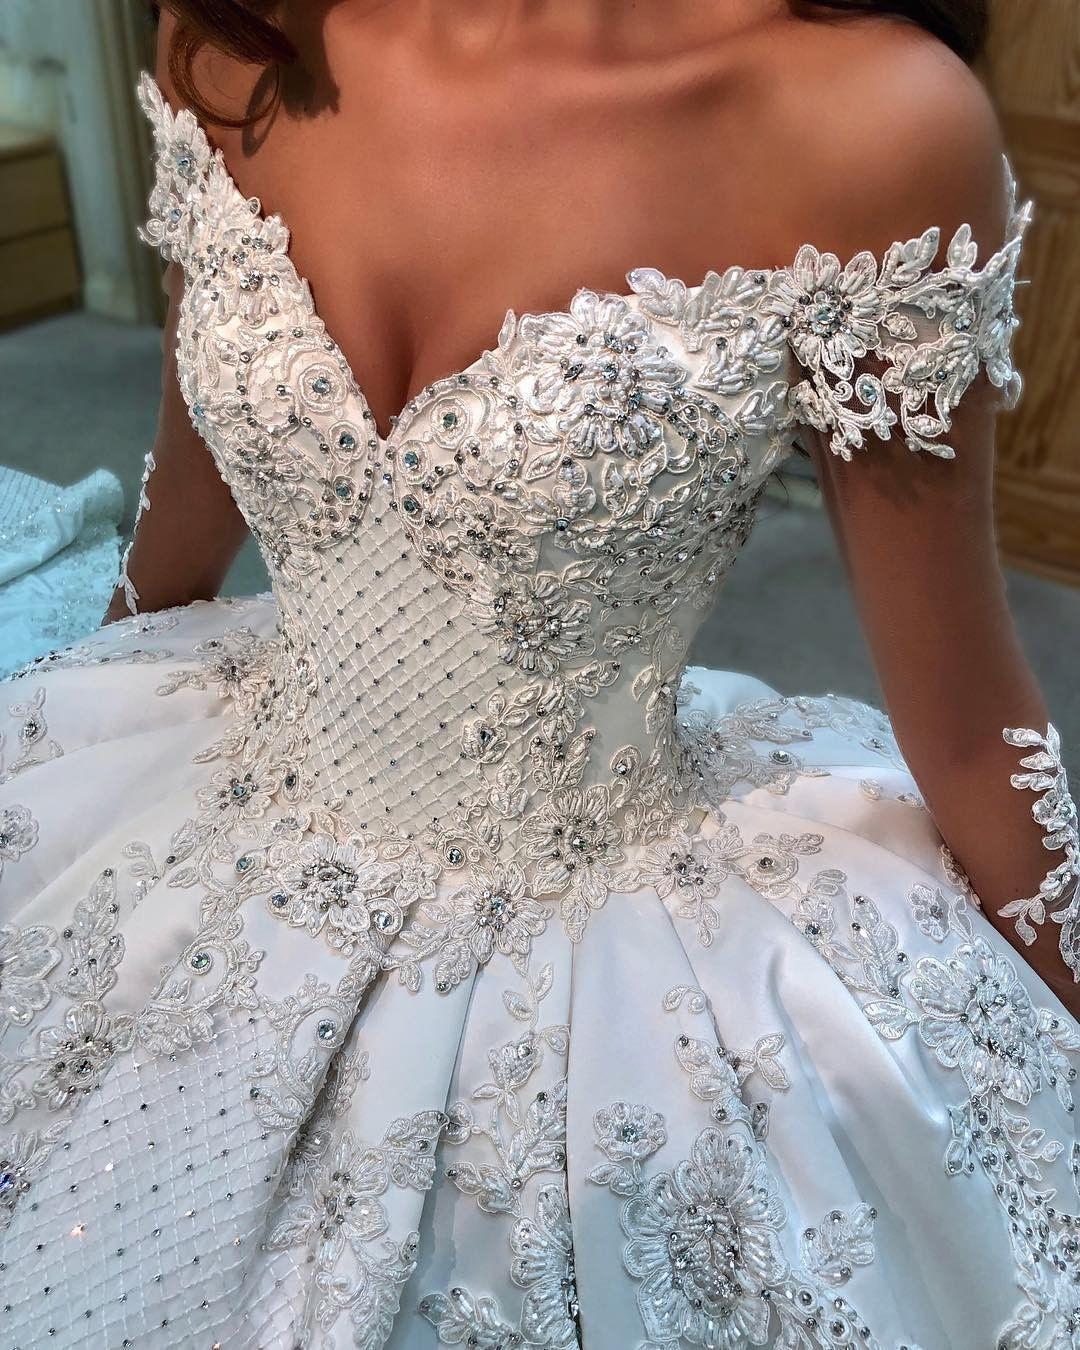 Weddingtips These Details Follow For More Inspiration Couturedress Weddinggown Bridalfashion B Princess Wedding Dresses Ball Gowns Wedding Wedding Dresses [ 1350 x 1080 Pixel ]